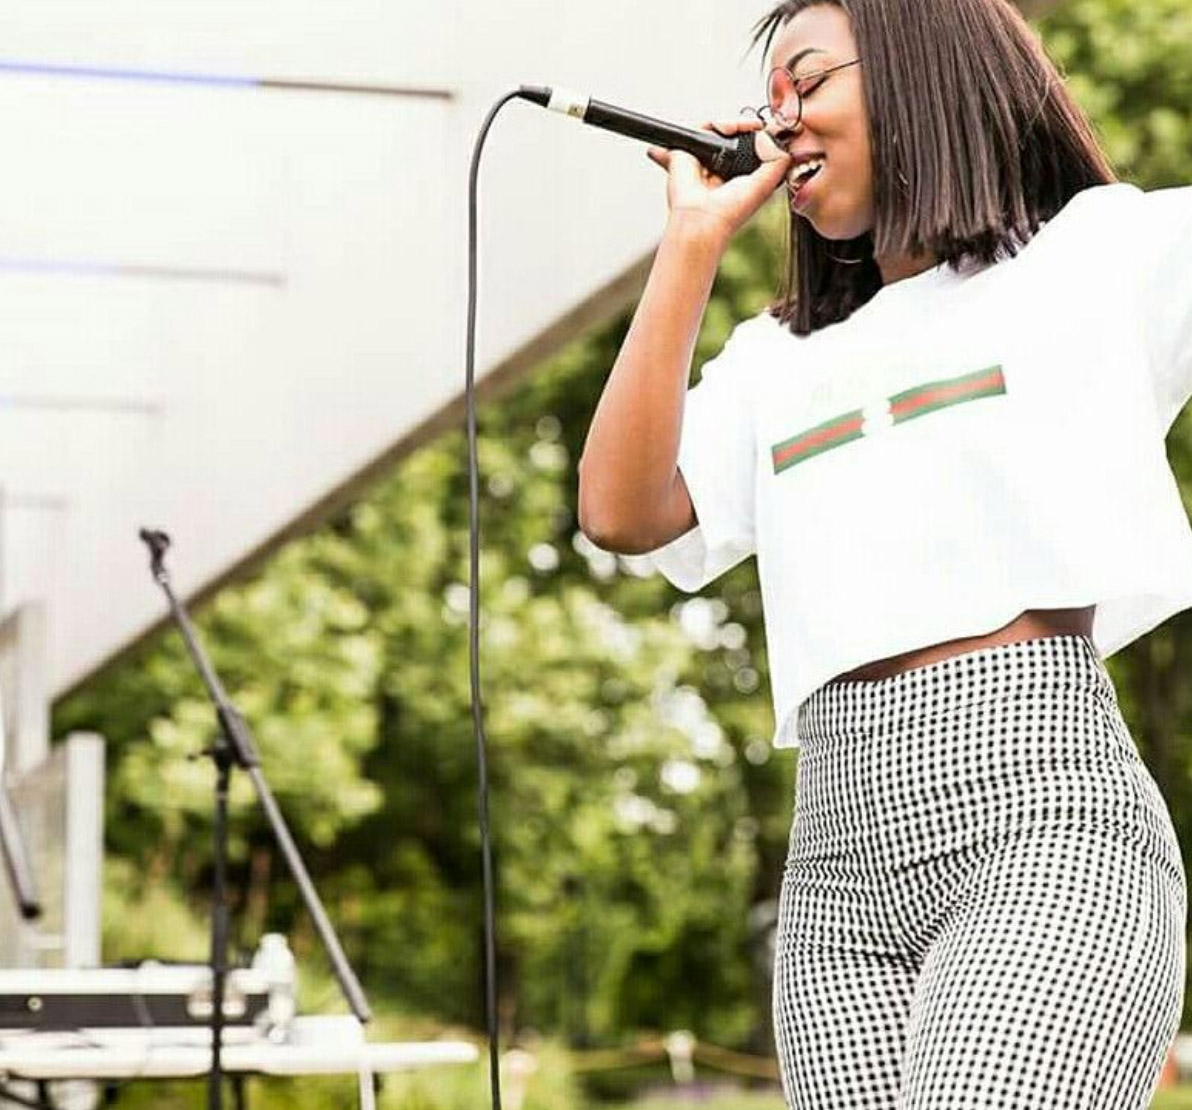 Kye @ Voice Fest 2017 (c)  @_afrozack